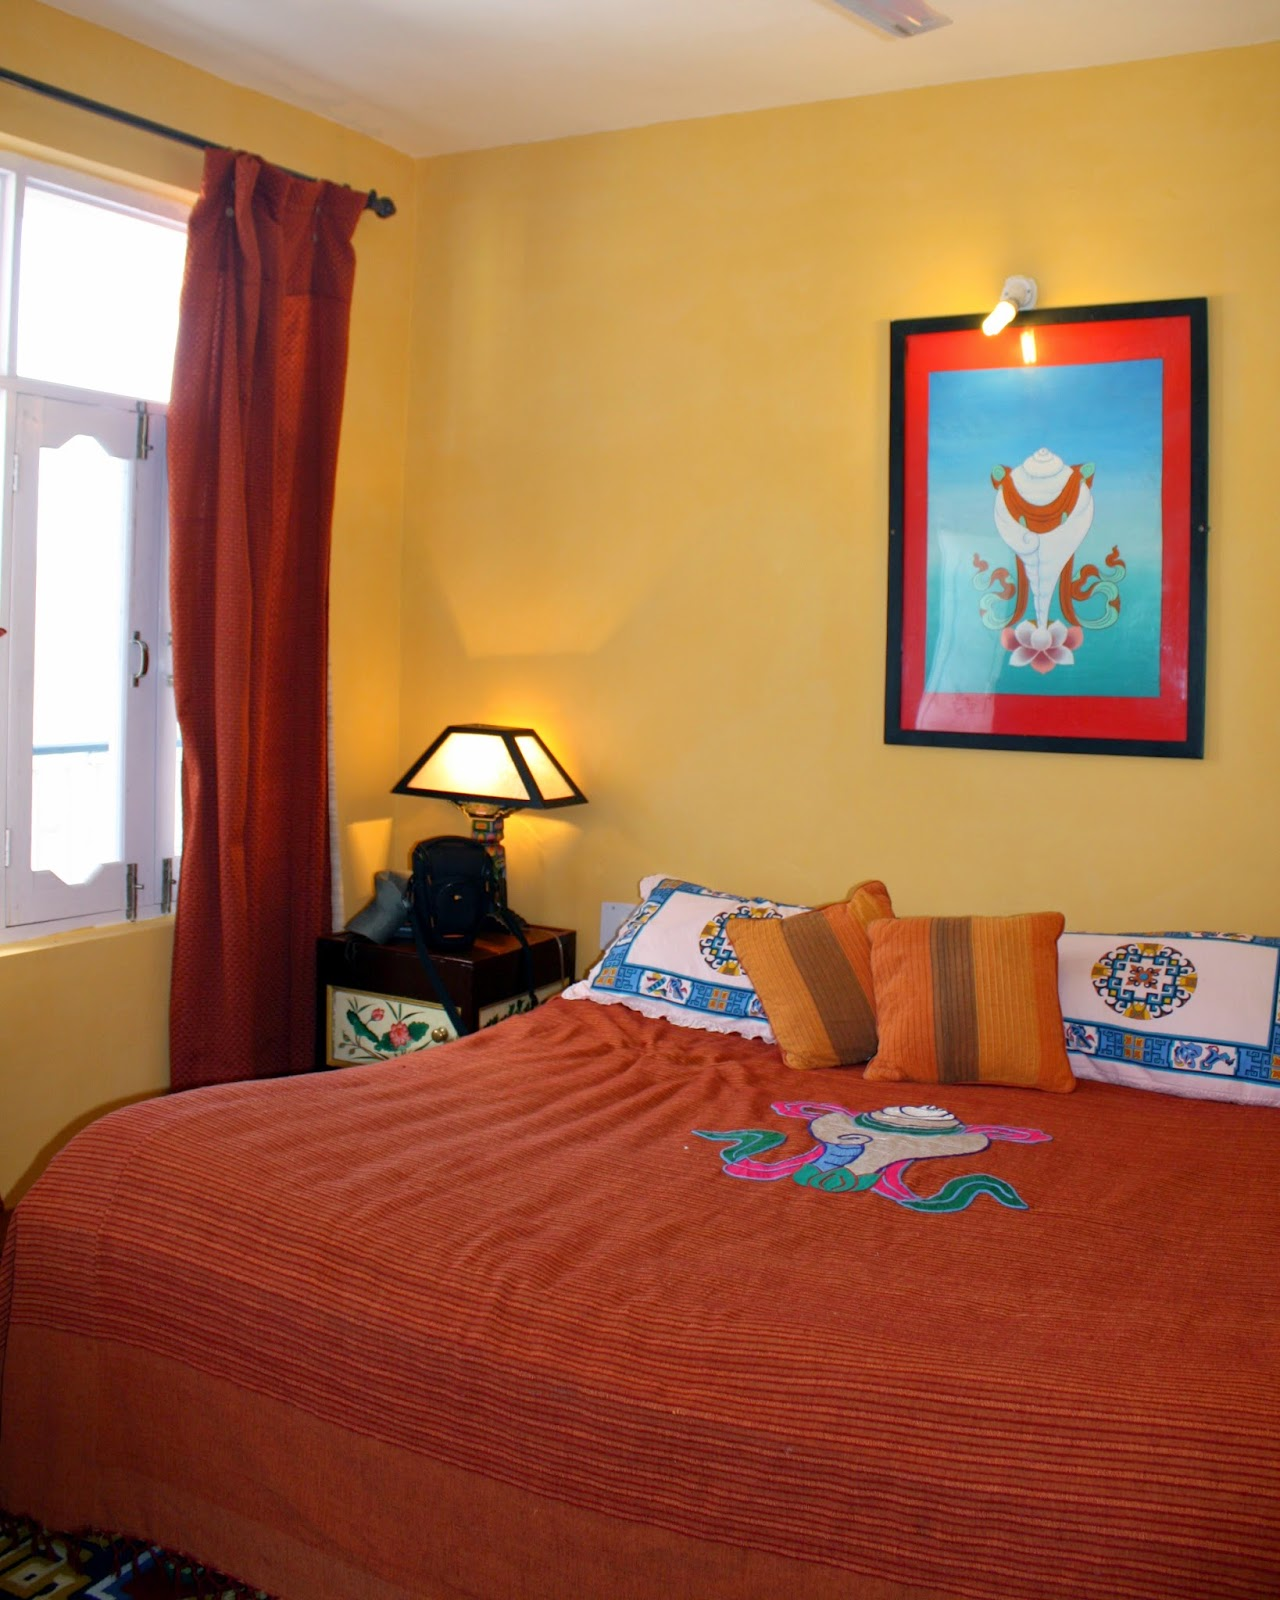 White Conch Room 8 Auspicious Him View Hotel McLeod Ganj Dharamsala India